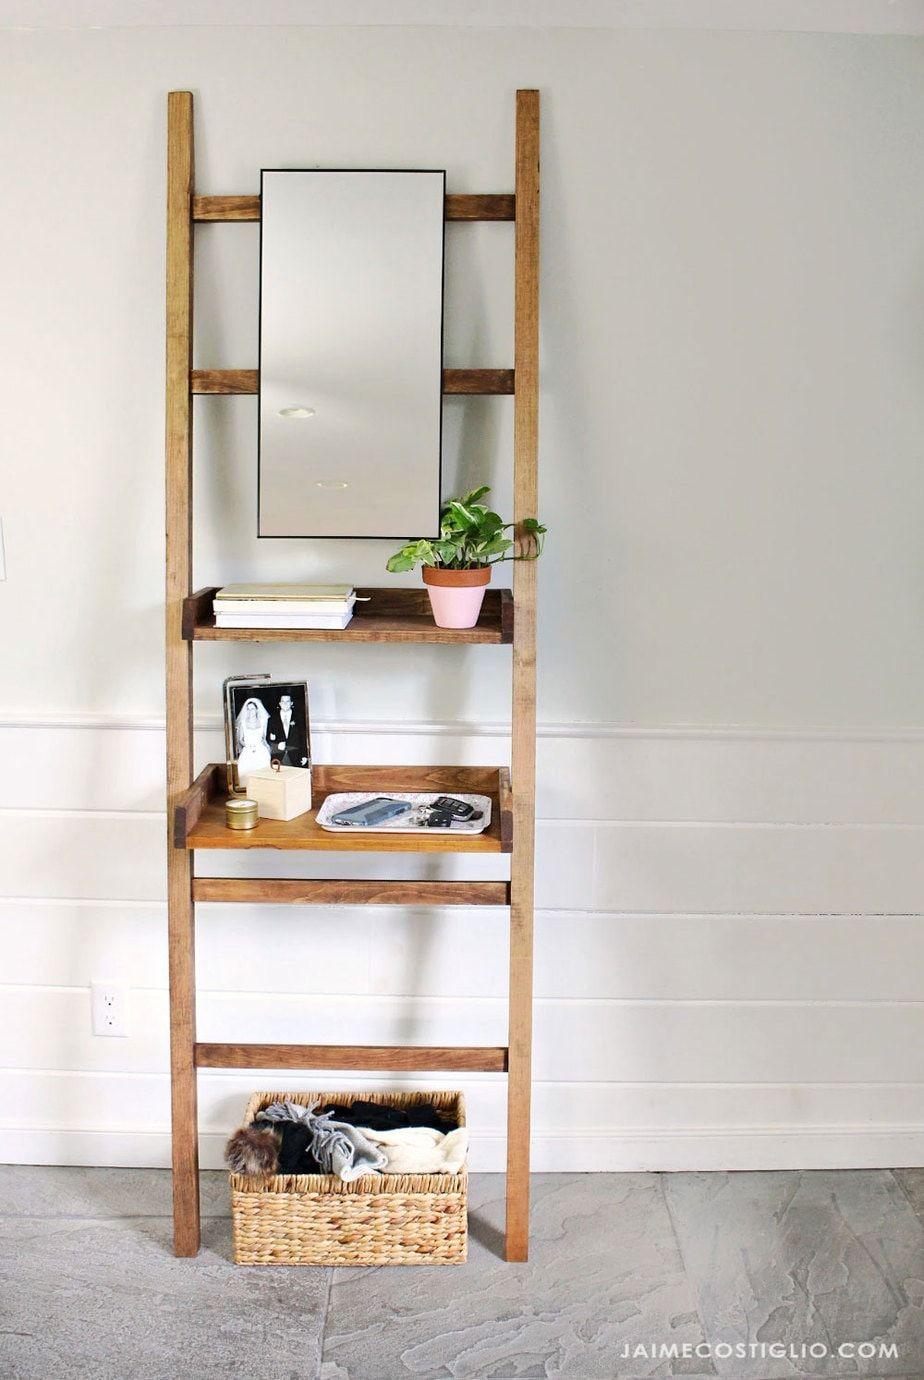 Diy Leaning Shelf For Entry Or Vanity Leaning Shelf Easy Home